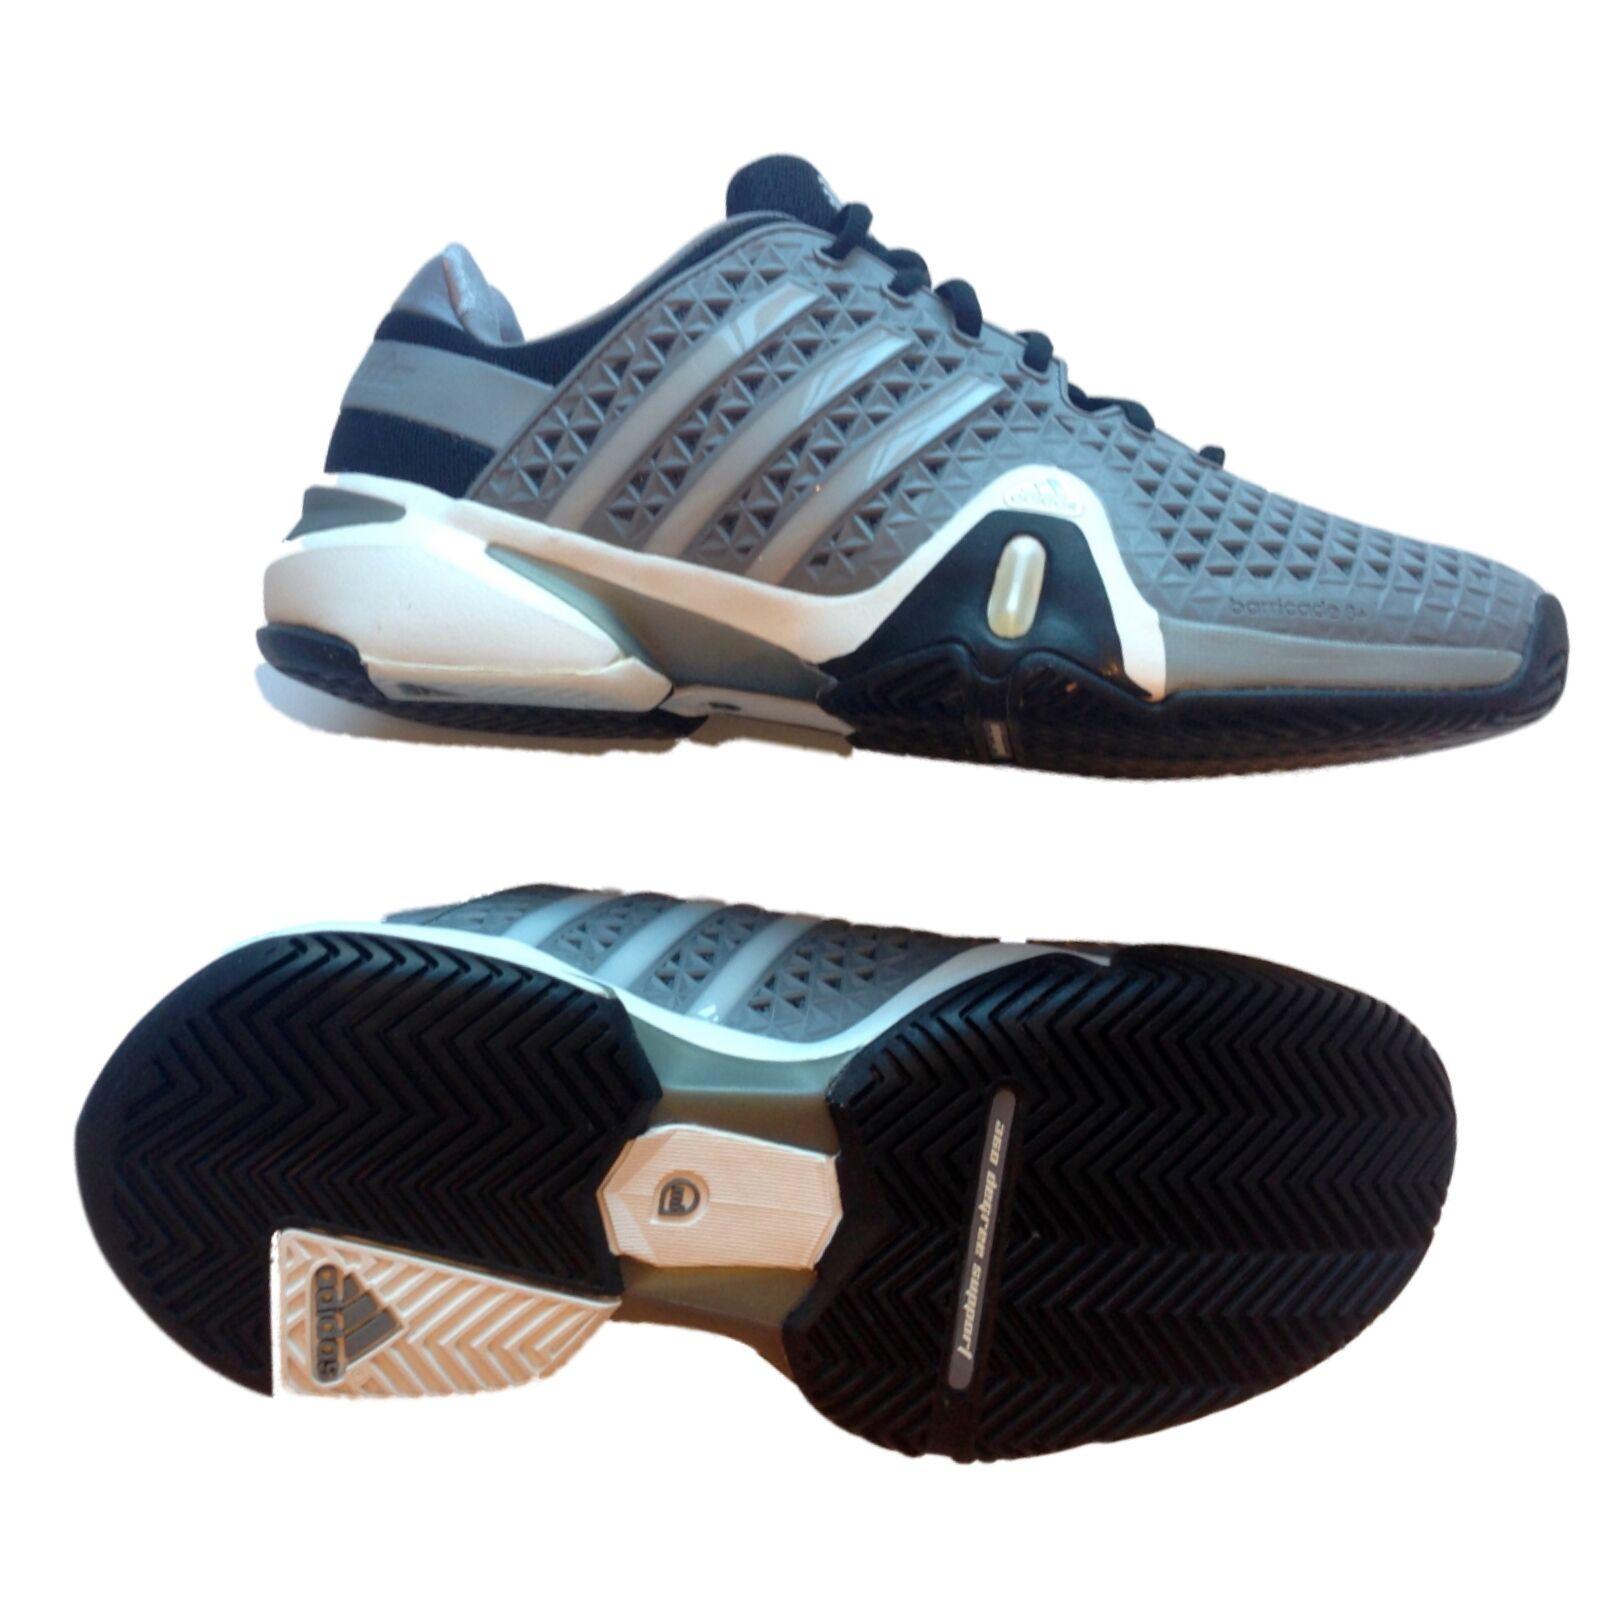 Adidas Sportschuhe adipower Tennisschuhe adipower Sportschuhe barricade 8+ Herren 1e64e0